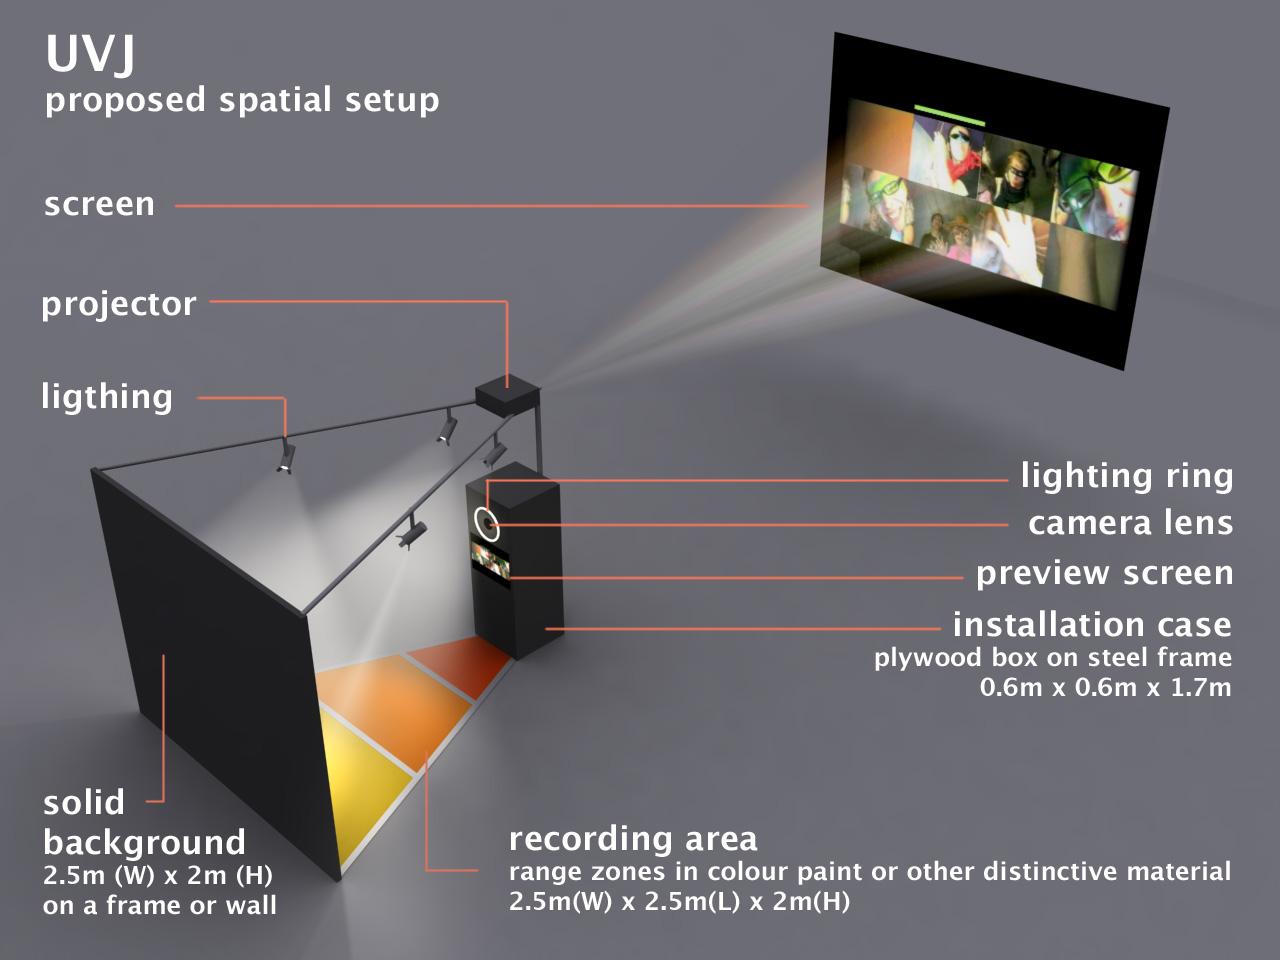 UVJ spatial setup